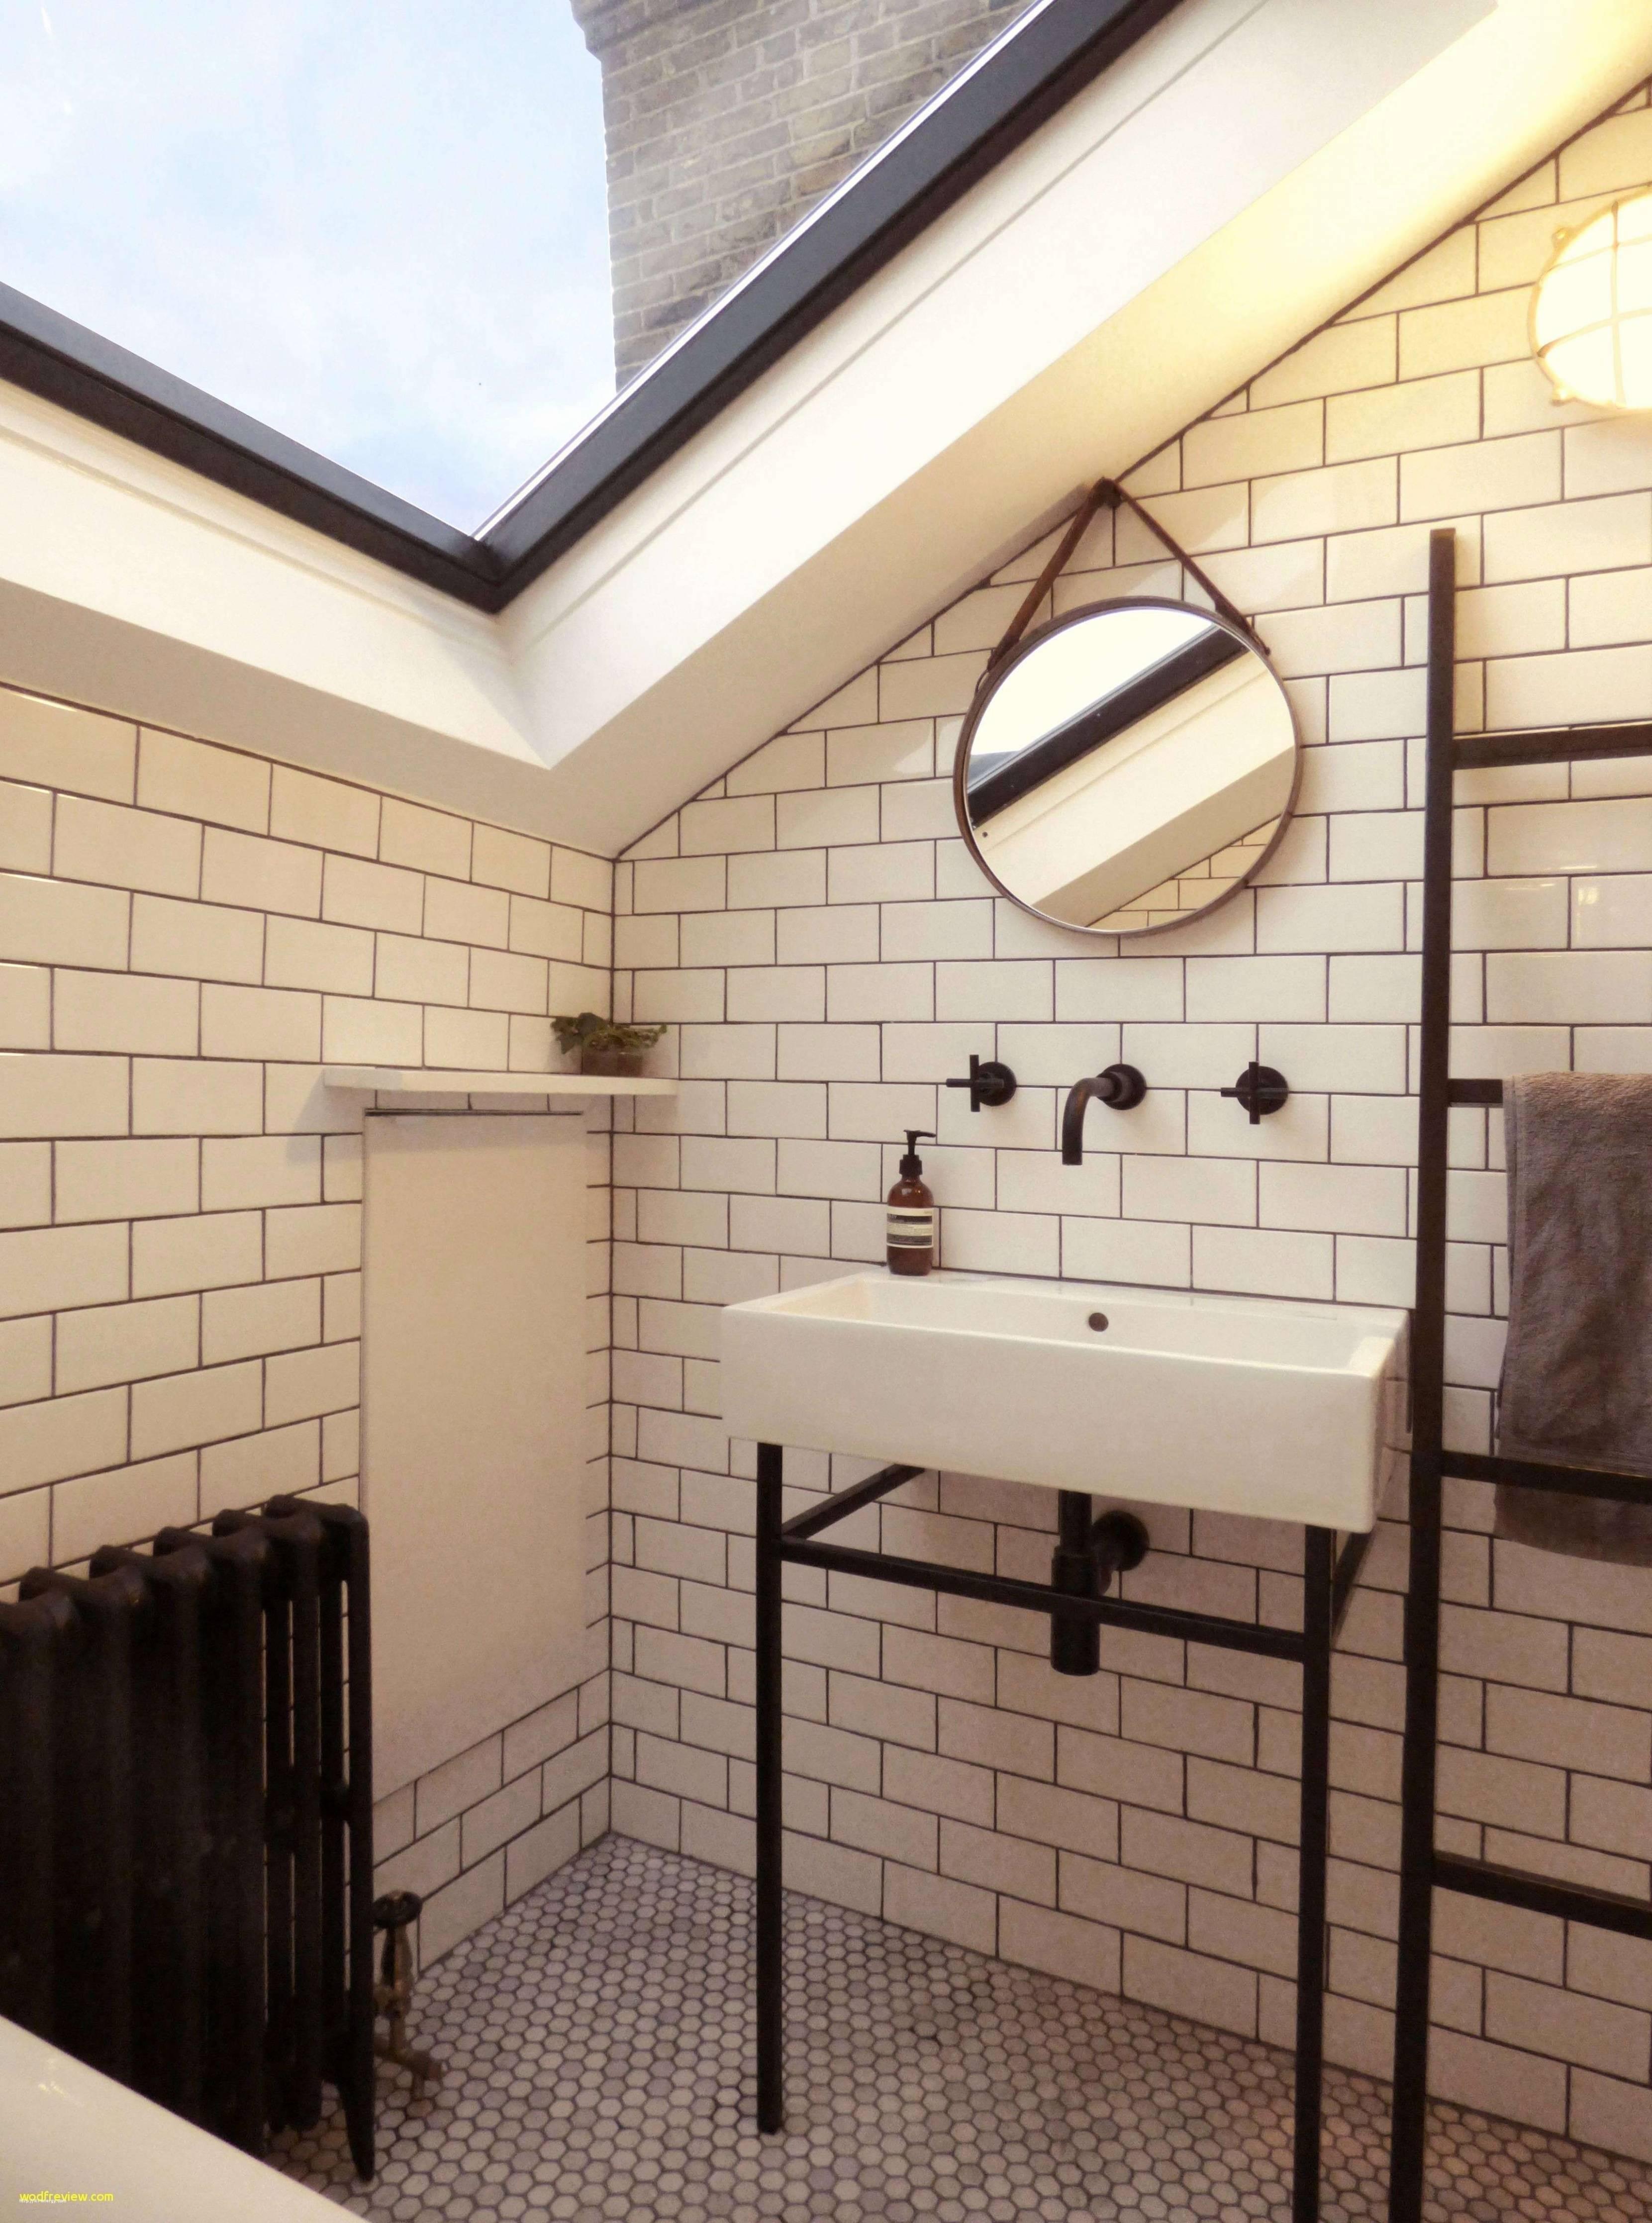 rustic decor ideas for bathroom new bathroom backsplash seducing 76 beautiful rustic bathroom tile ideas of rustic decor ideas for bathroom